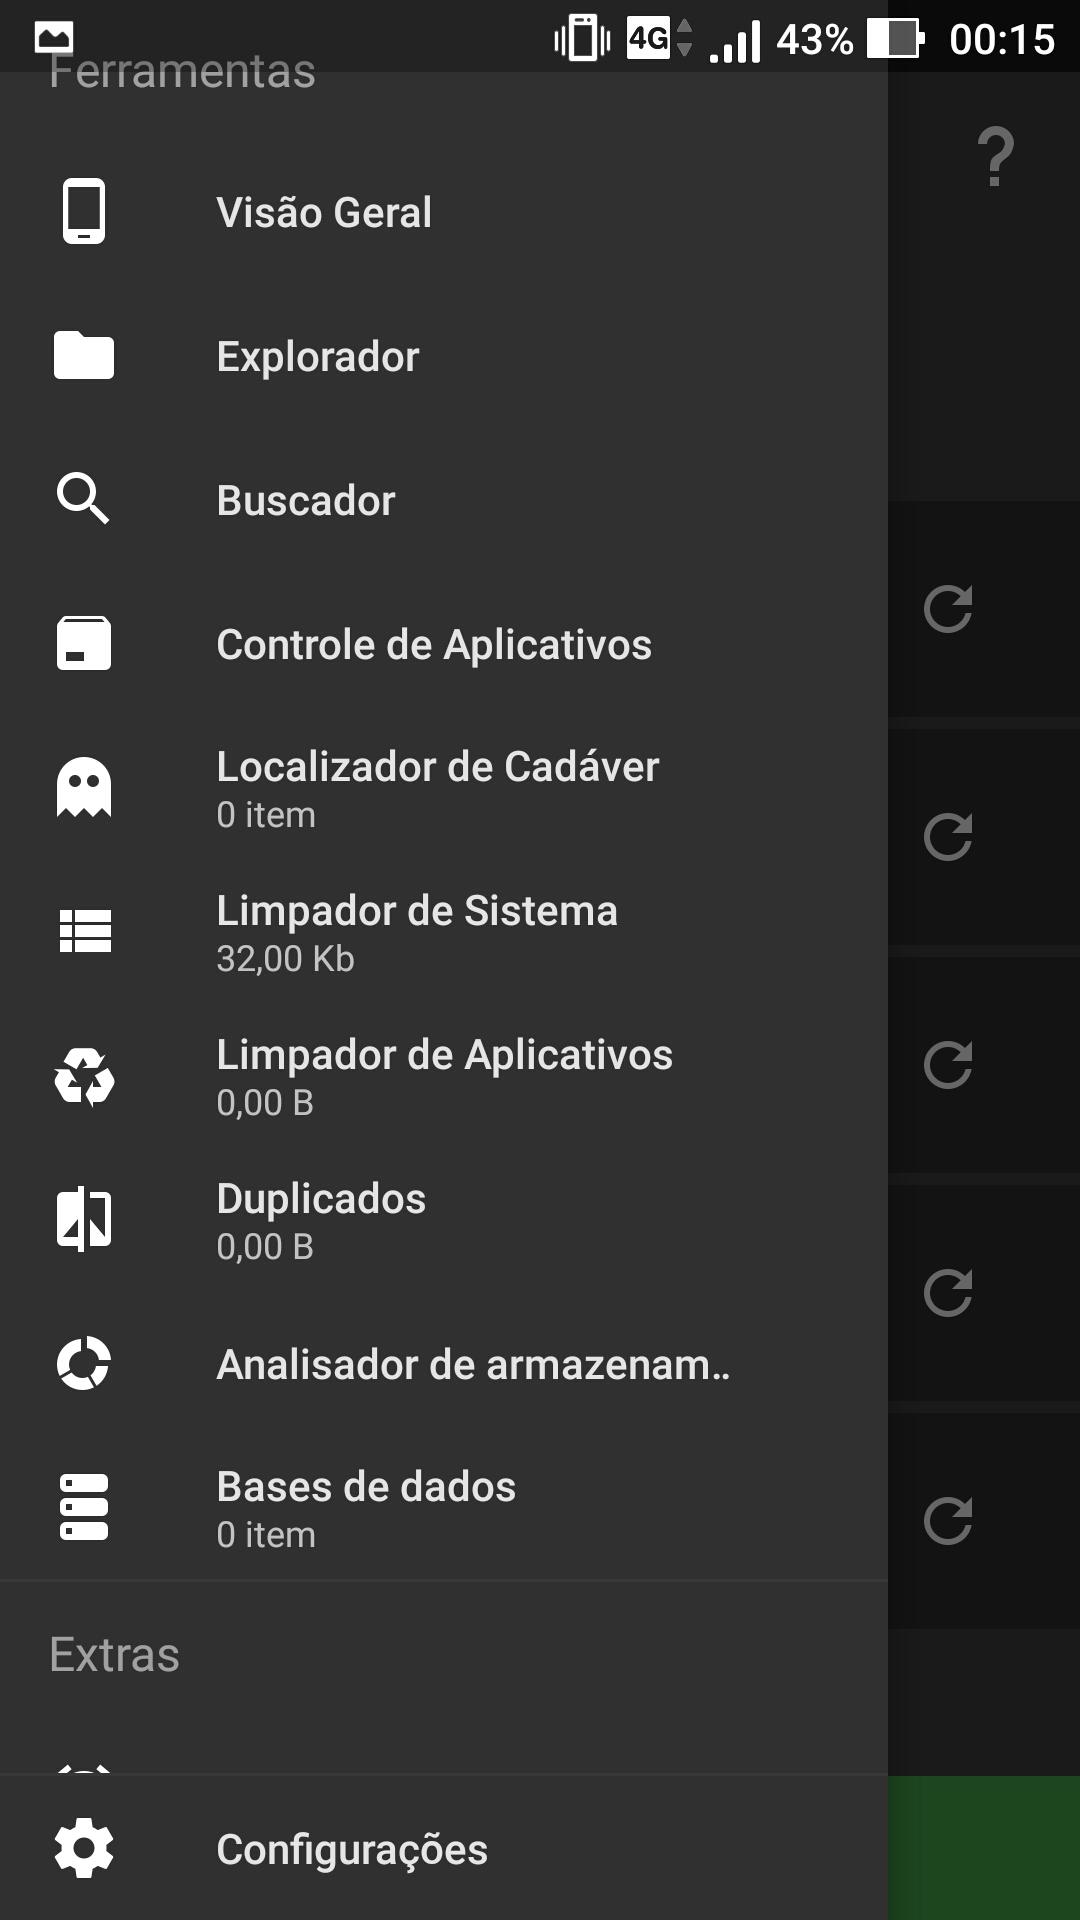 screenshot_20171102-001518